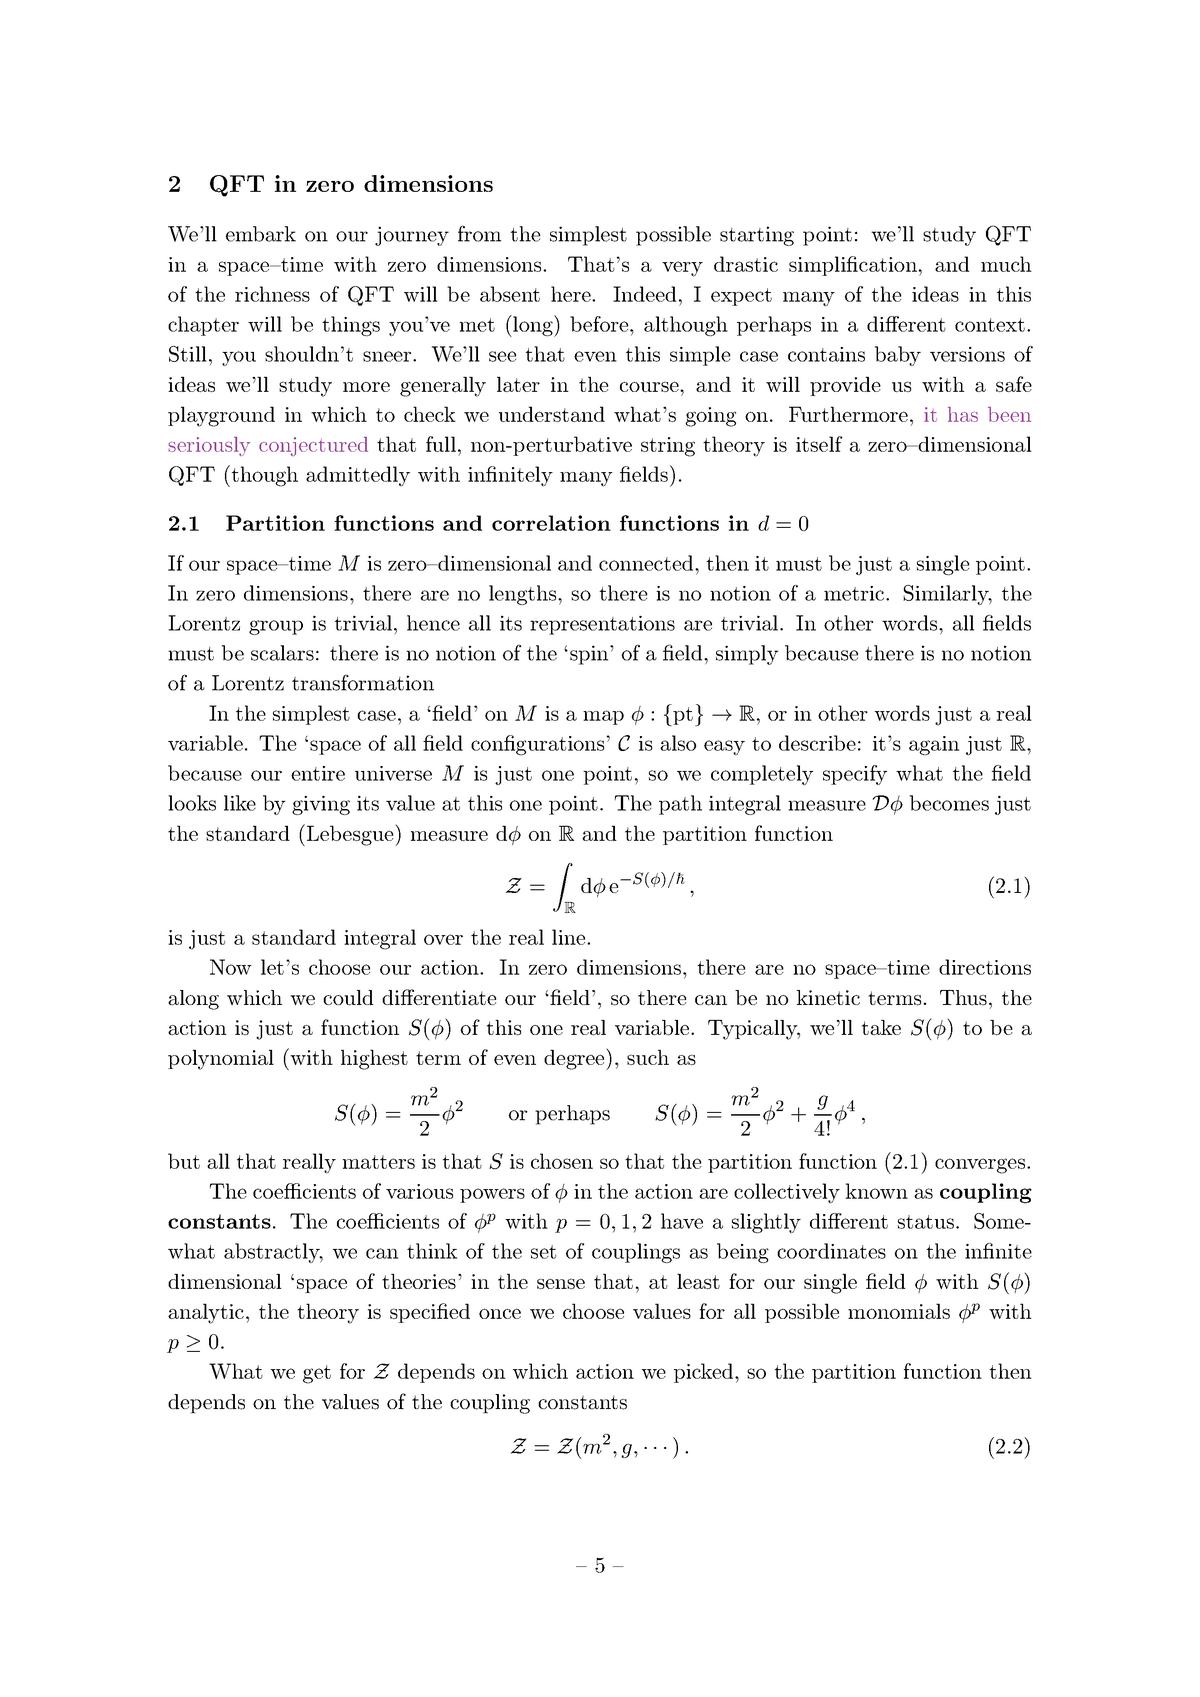 Quantum Field Theory: QFT in Zero Dimensions - - Tees - StuDocu